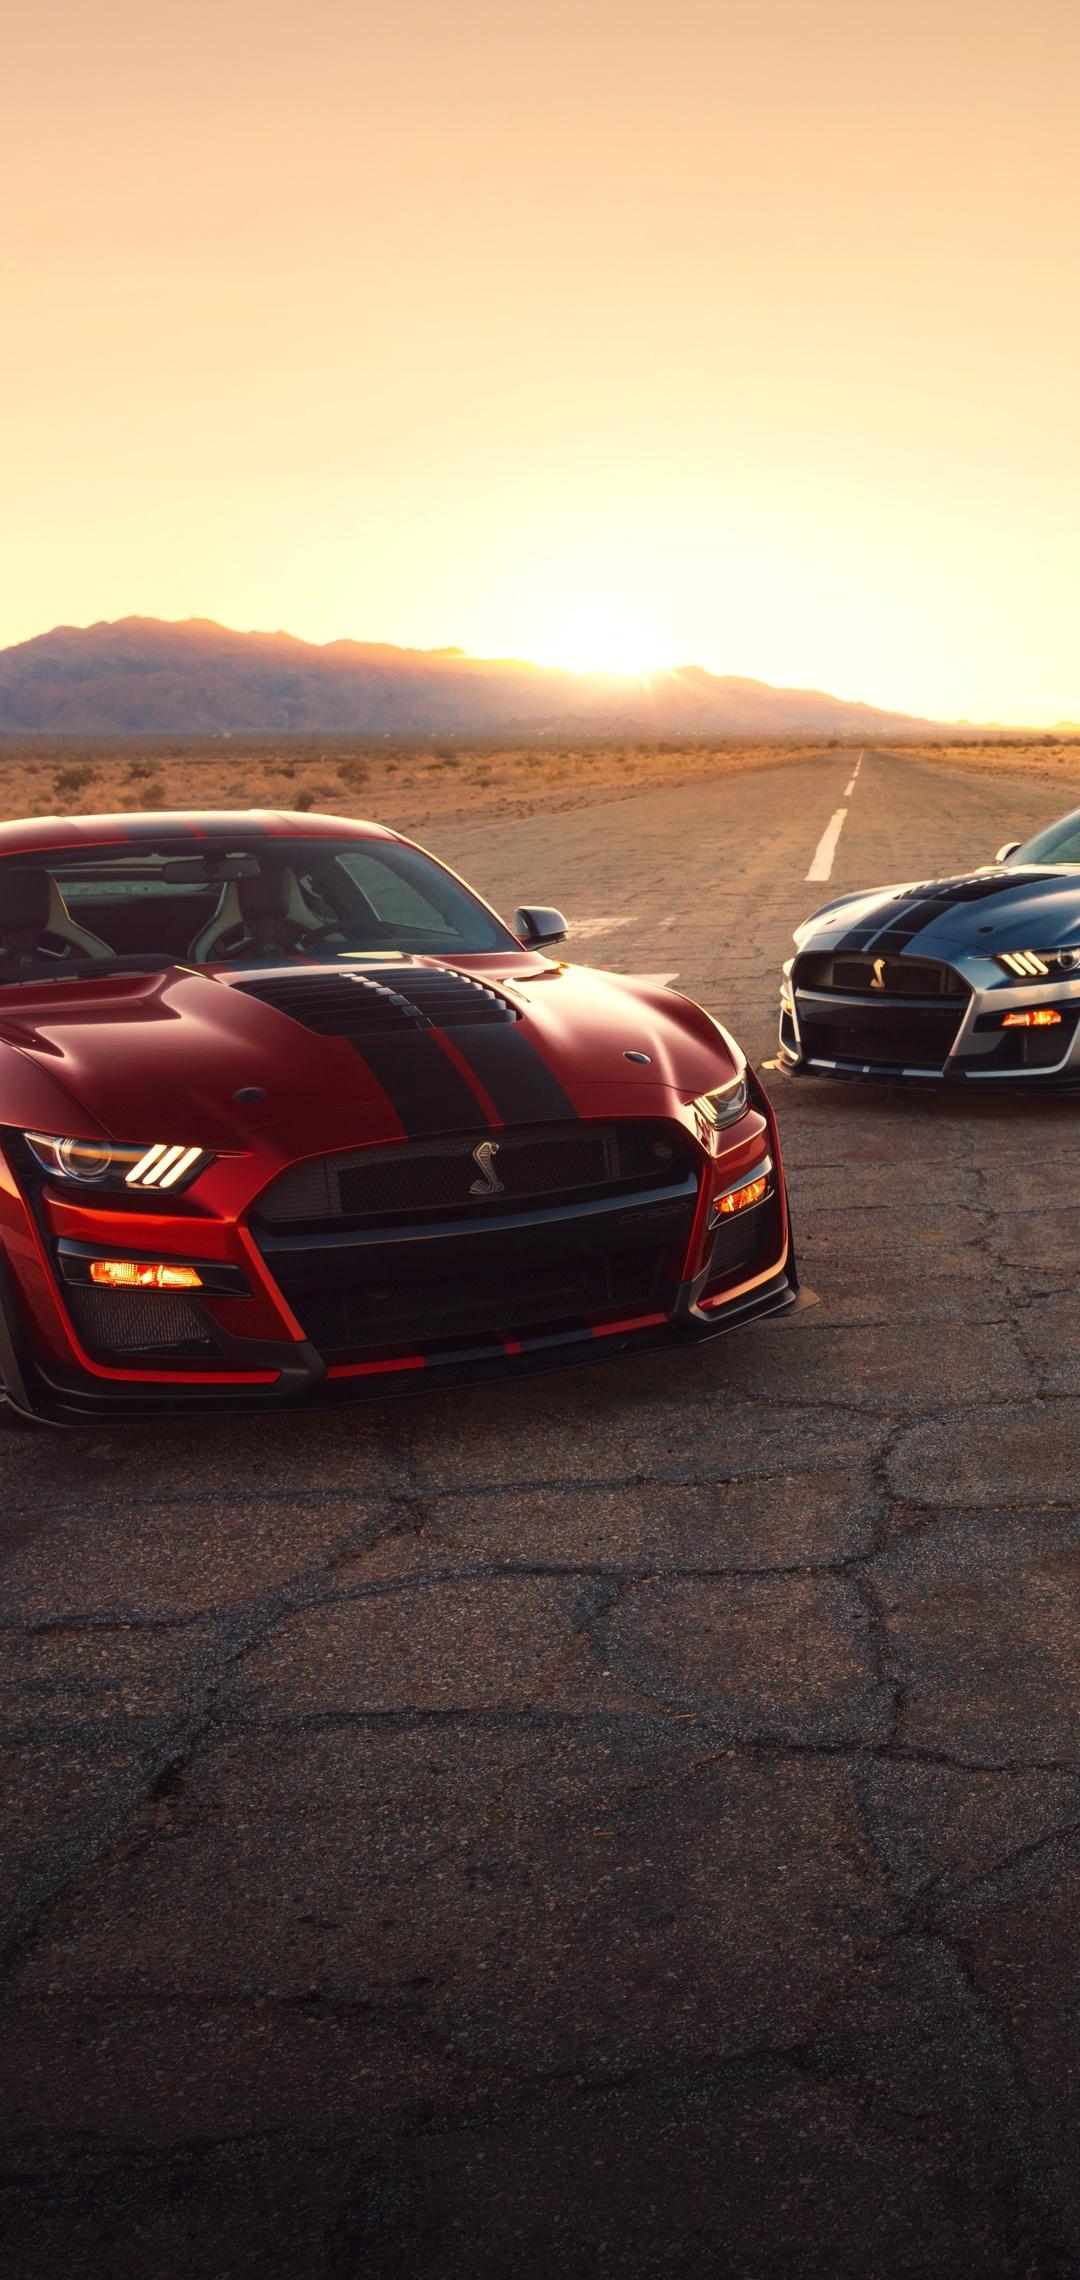 2020 Mustang Gt500 4K Wallpaper